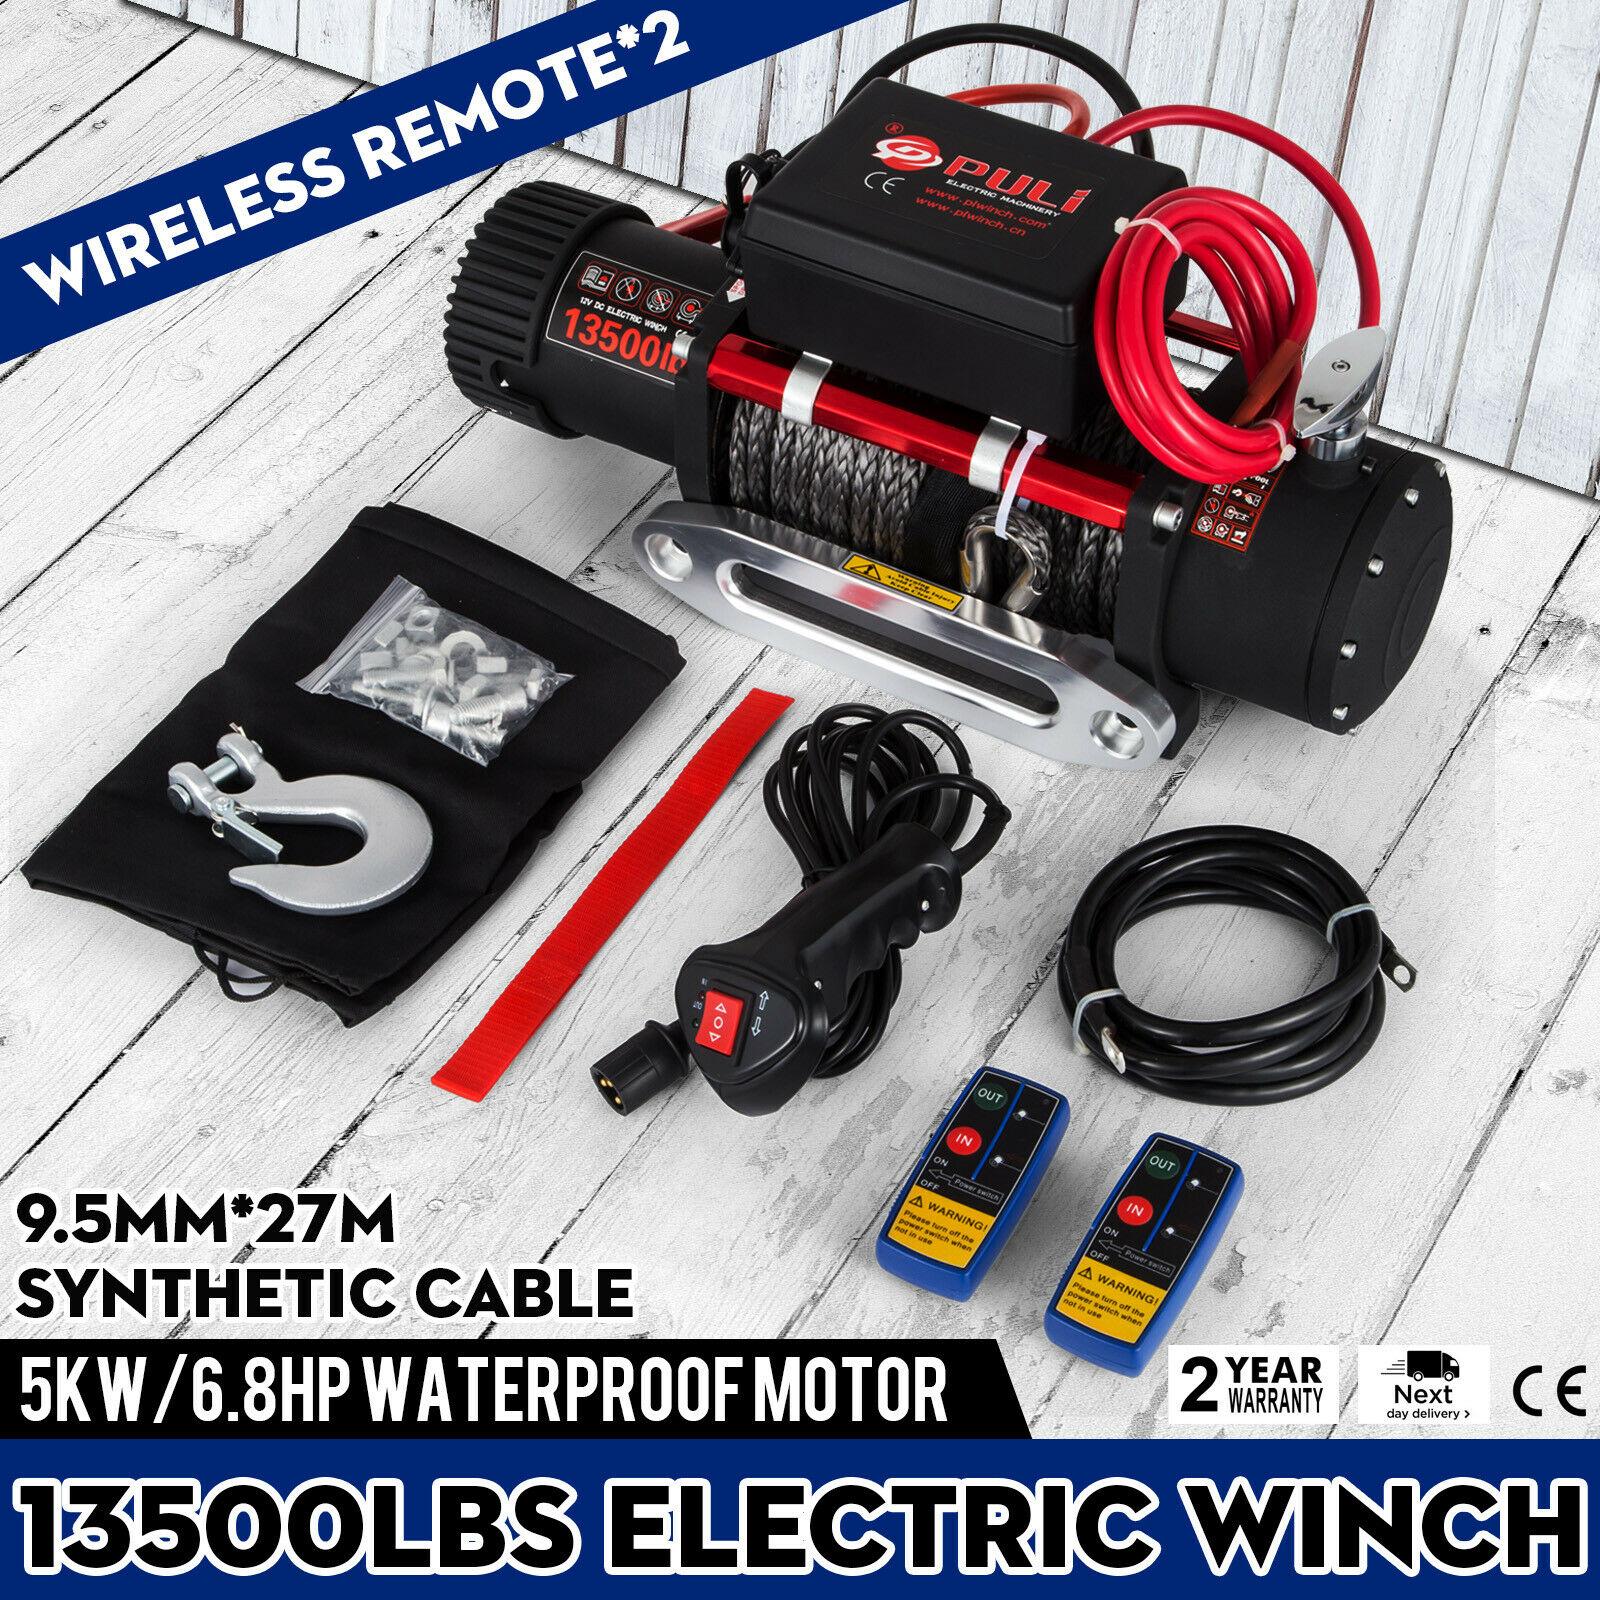 Kabestan elektryczny 13500LBS 12V elektryczna lina syntetyczna wciągarka 6123.5Kg pasuje do ATV UTV Recovery z 2 zdalne sterowanie